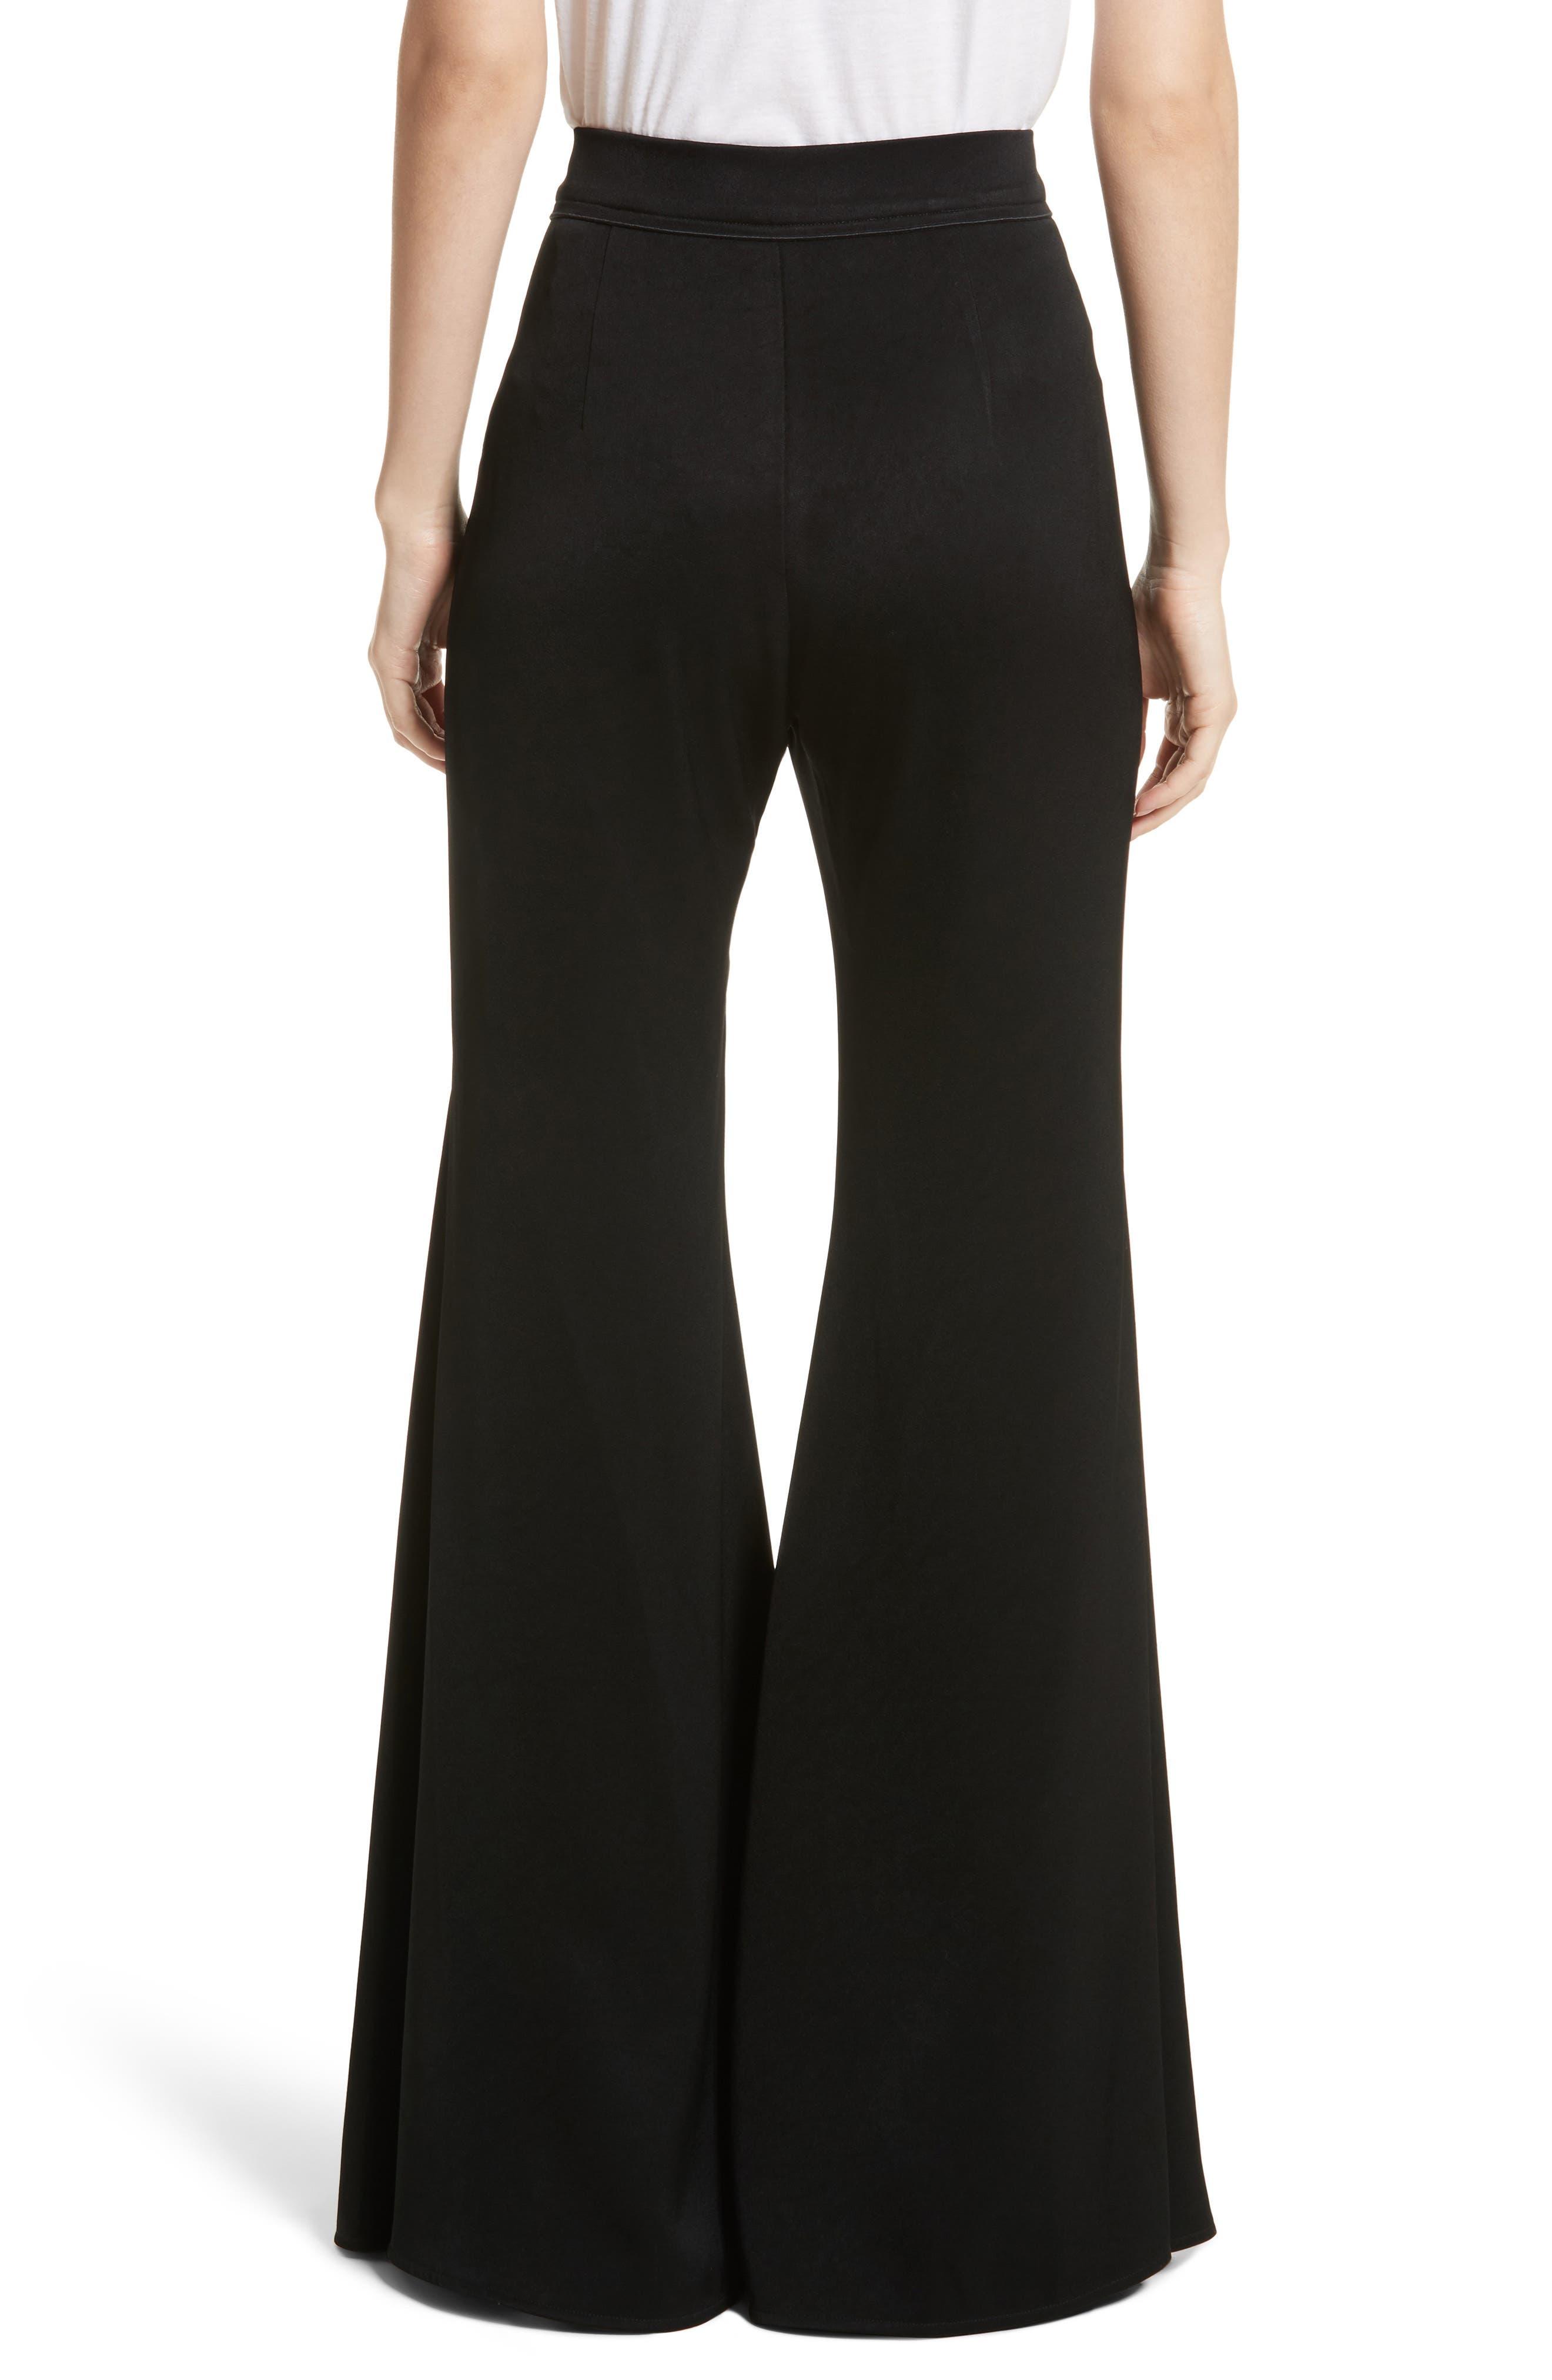 Higher & Higher Wide Flare Leg Pants,                             Alternate thumbnail 2, color,                             Black